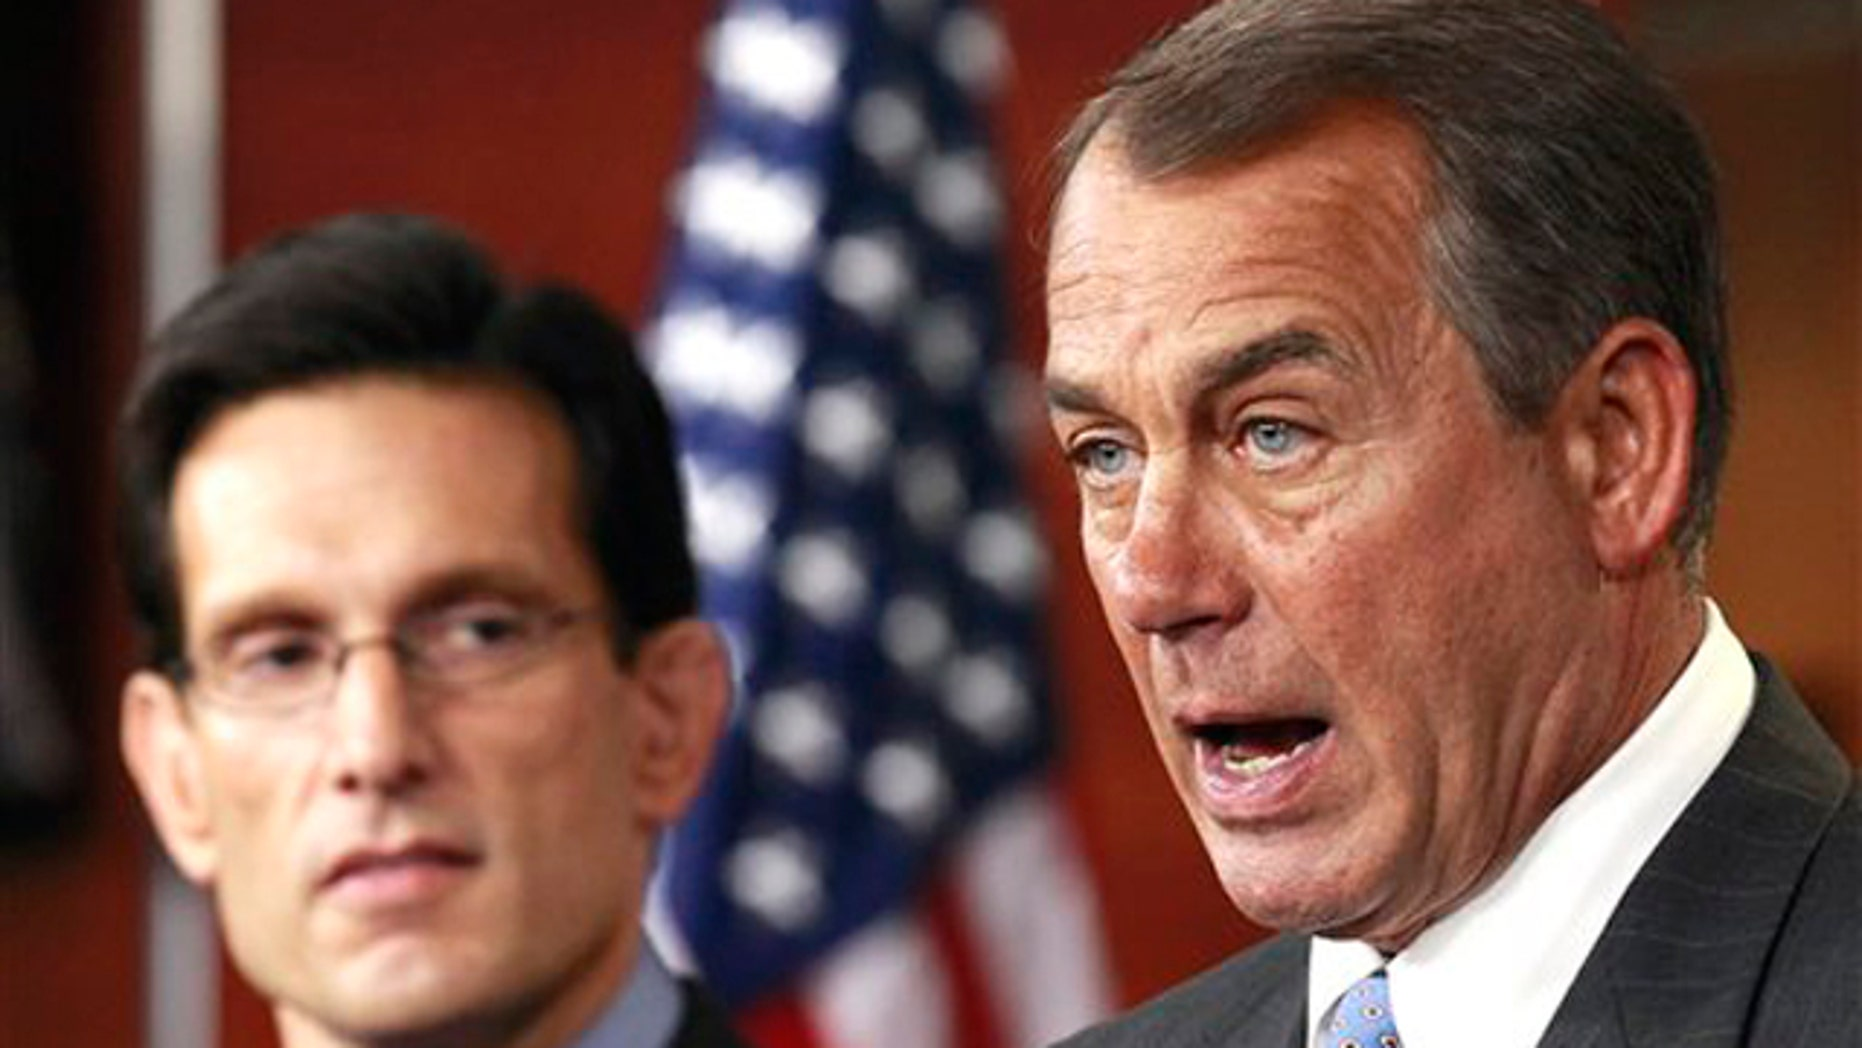 Jan. 6: House Speaker John Boehner, right, accompanied by House Majority Leader Eric Cantor, speaks to the media on Capitol Hill.